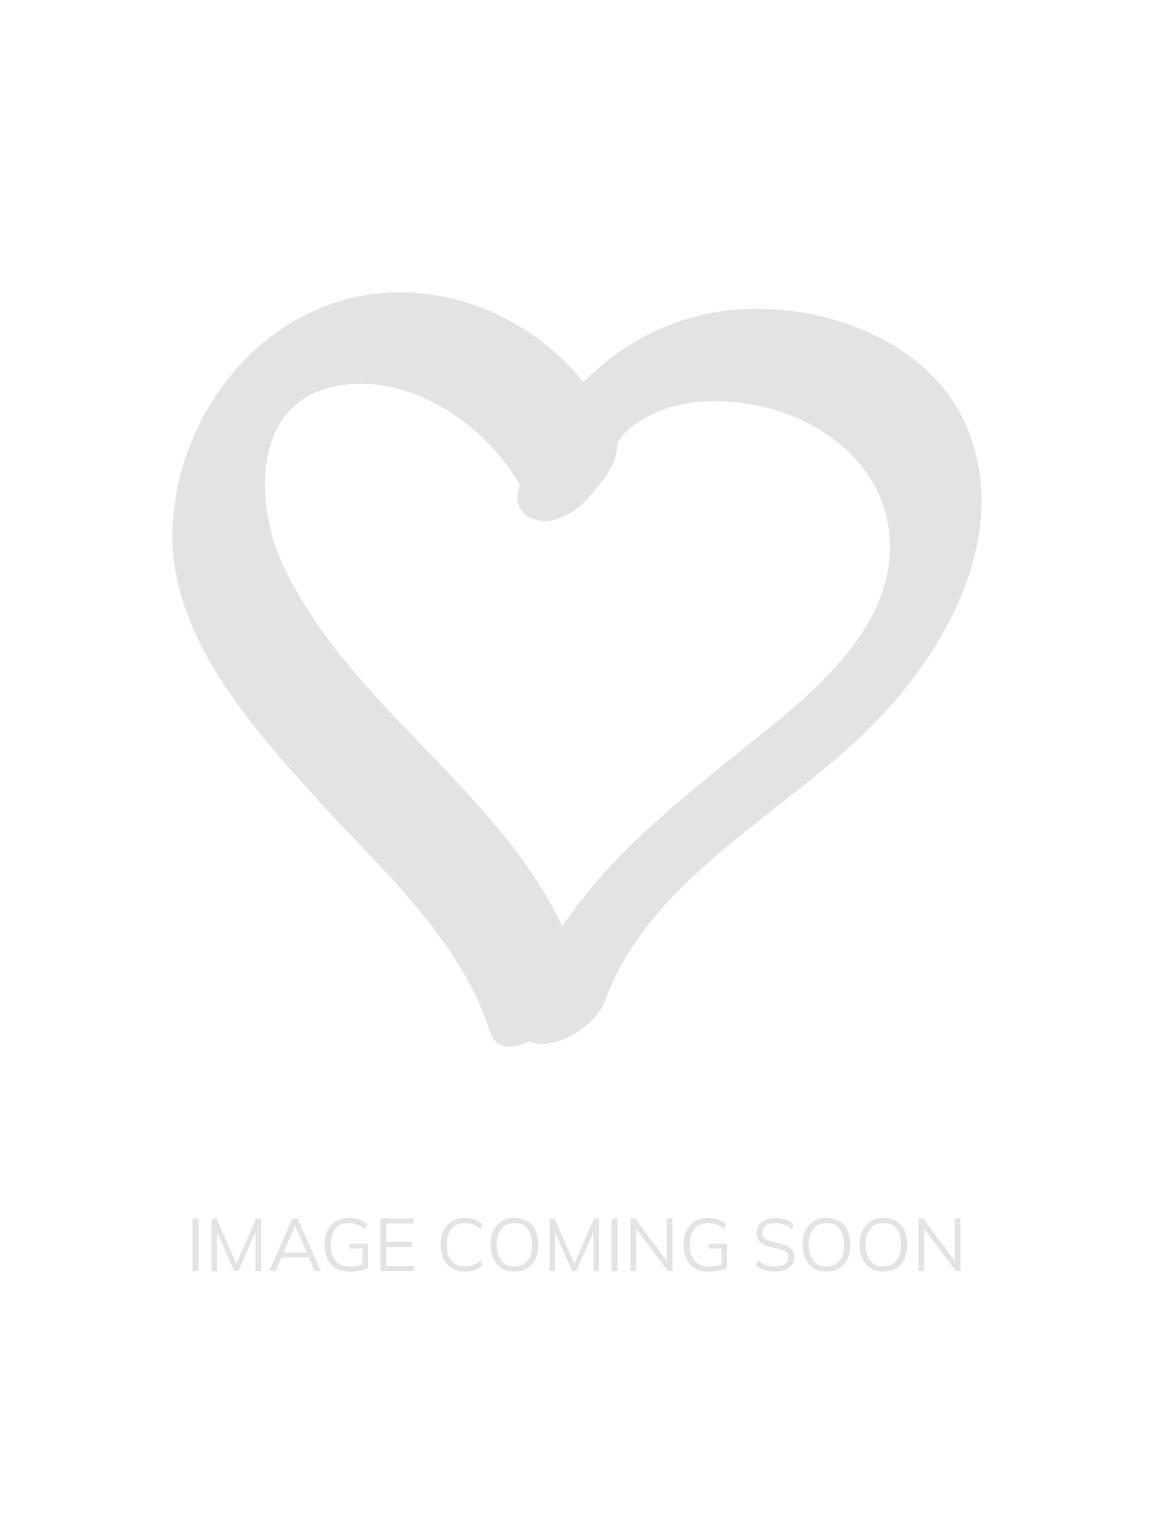 4b75da2de4afc Mamba Strapless/Bandeau Bikini Top - Multi | Lingerie Outlet Store